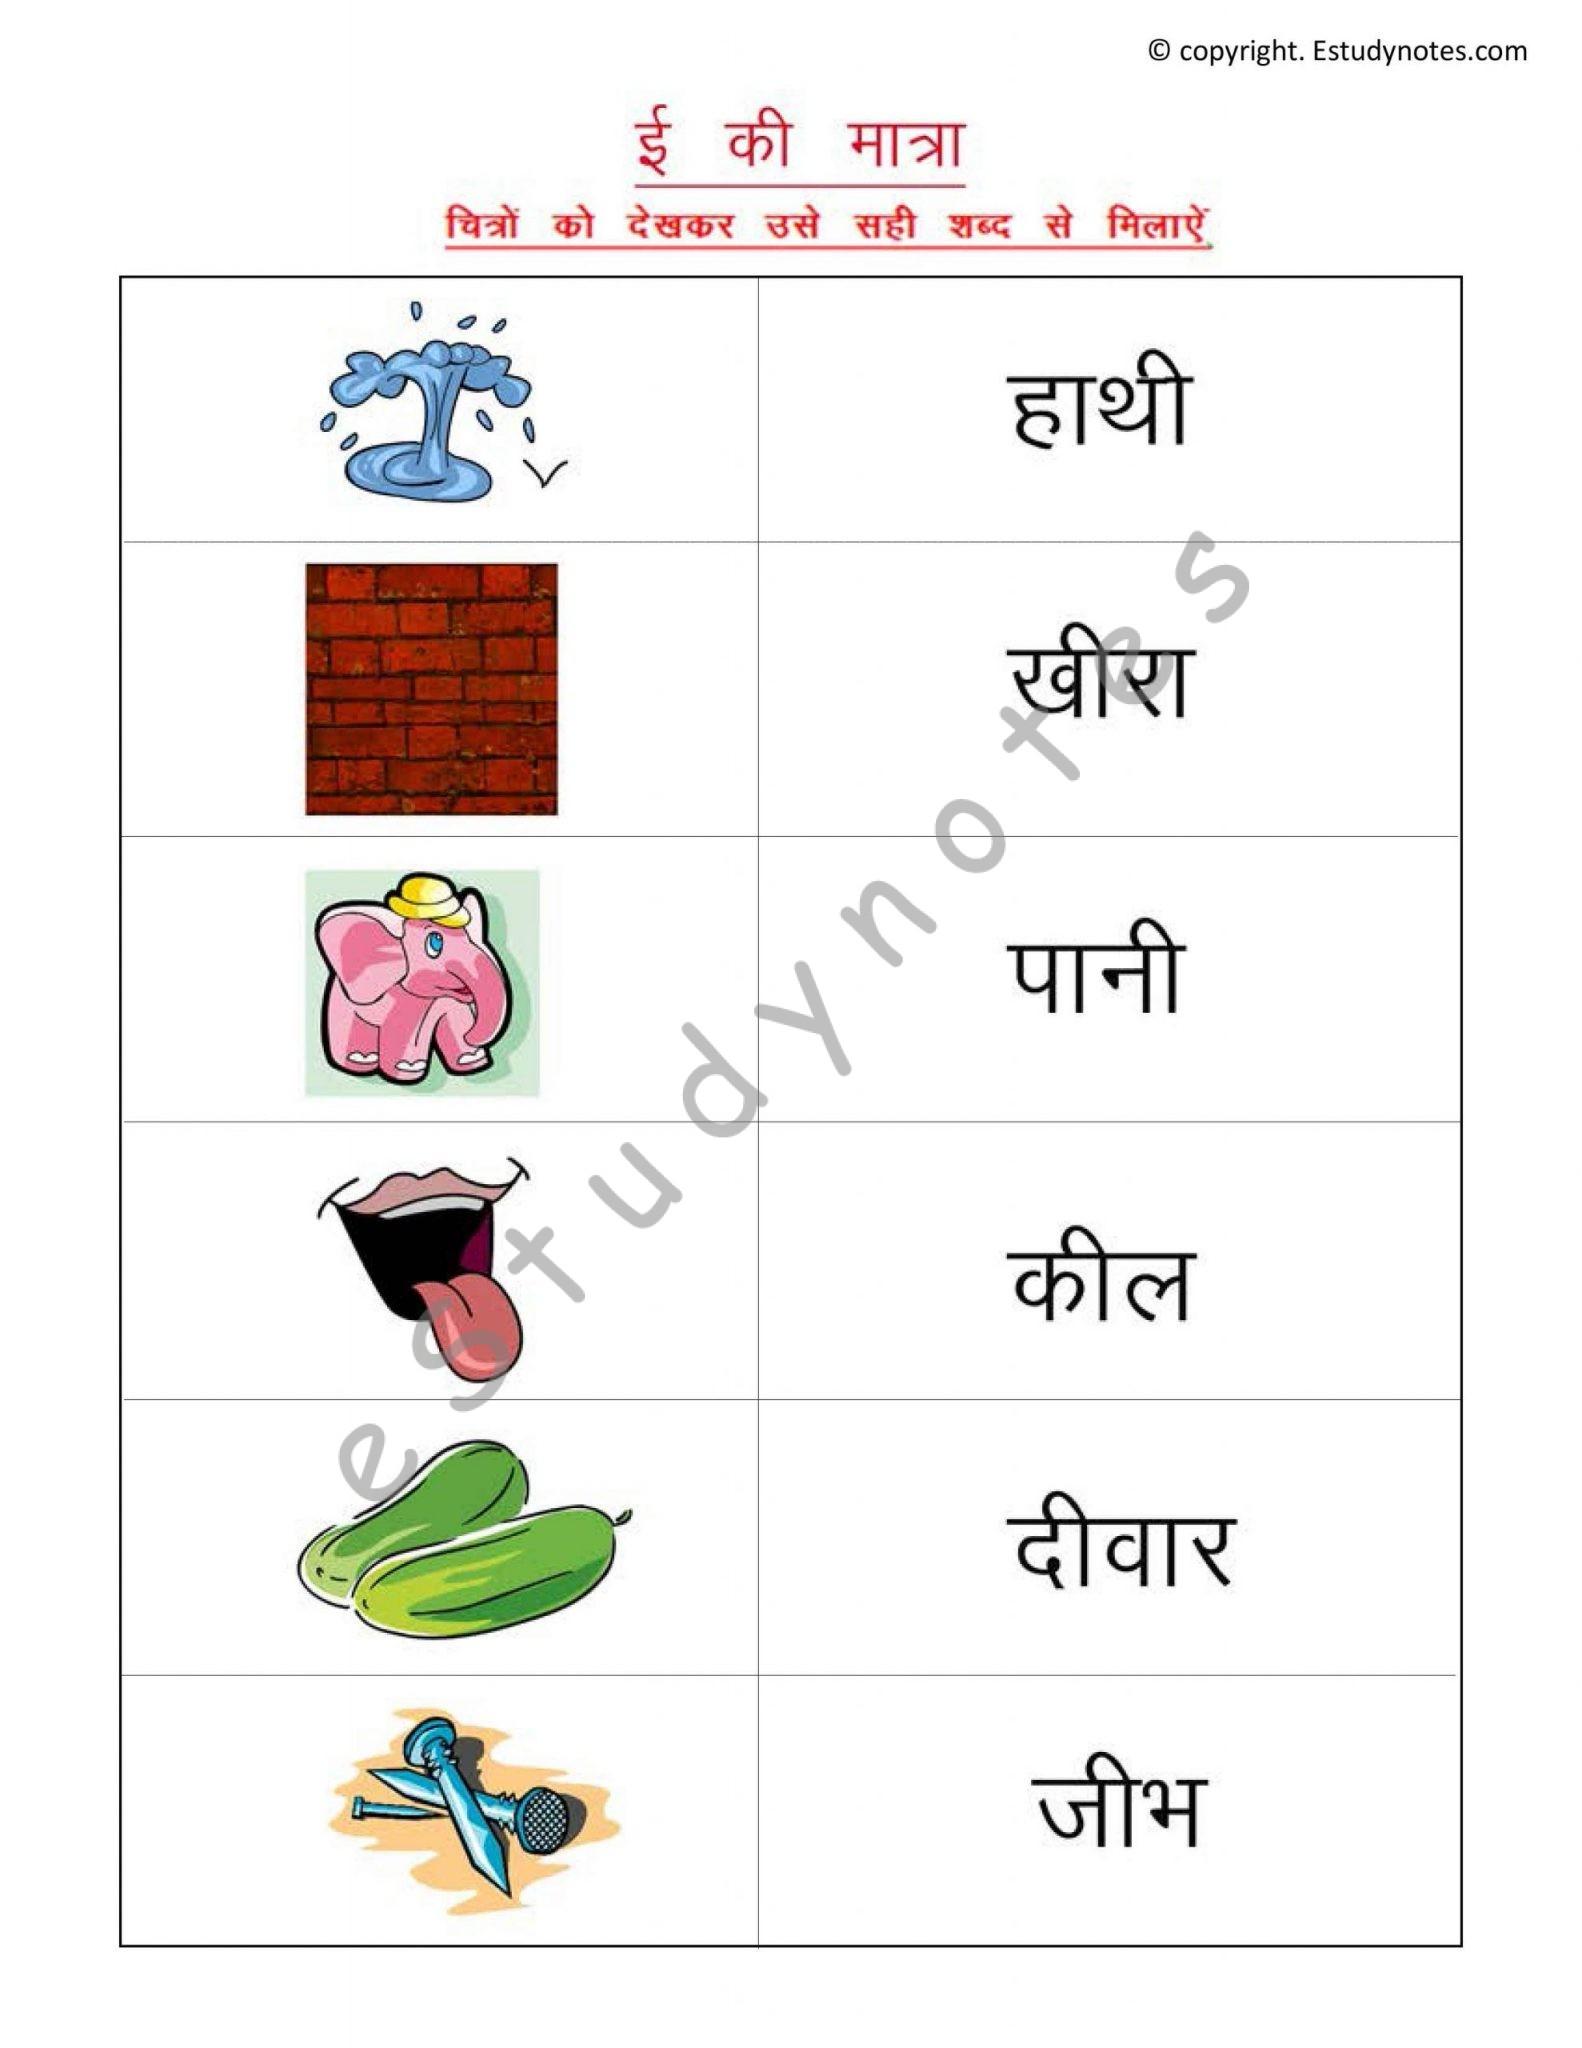 hight resolution of Ee Ki Matra - Hindi Workbook For Grade 1 - EStudyNotes